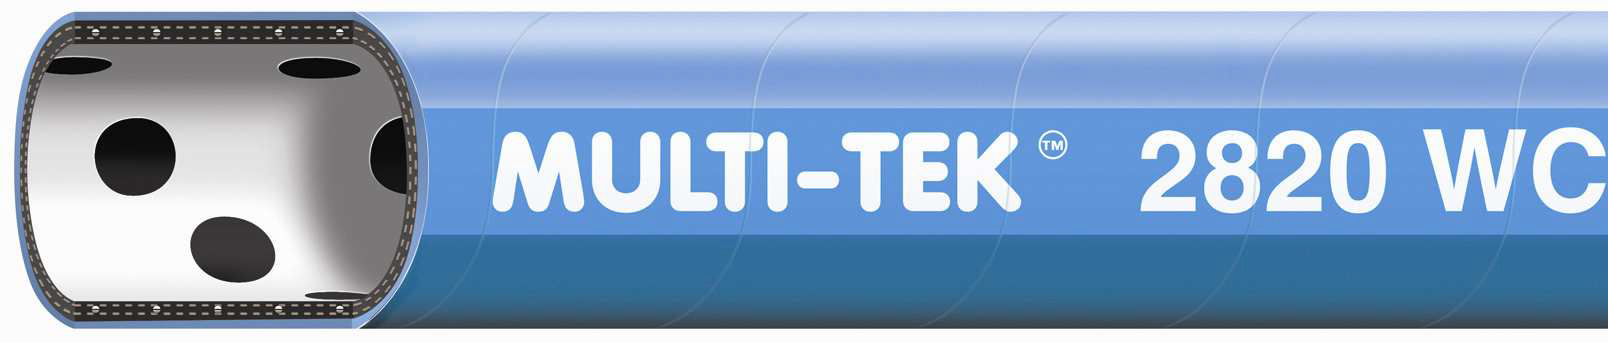 MULTI-TEK 2820